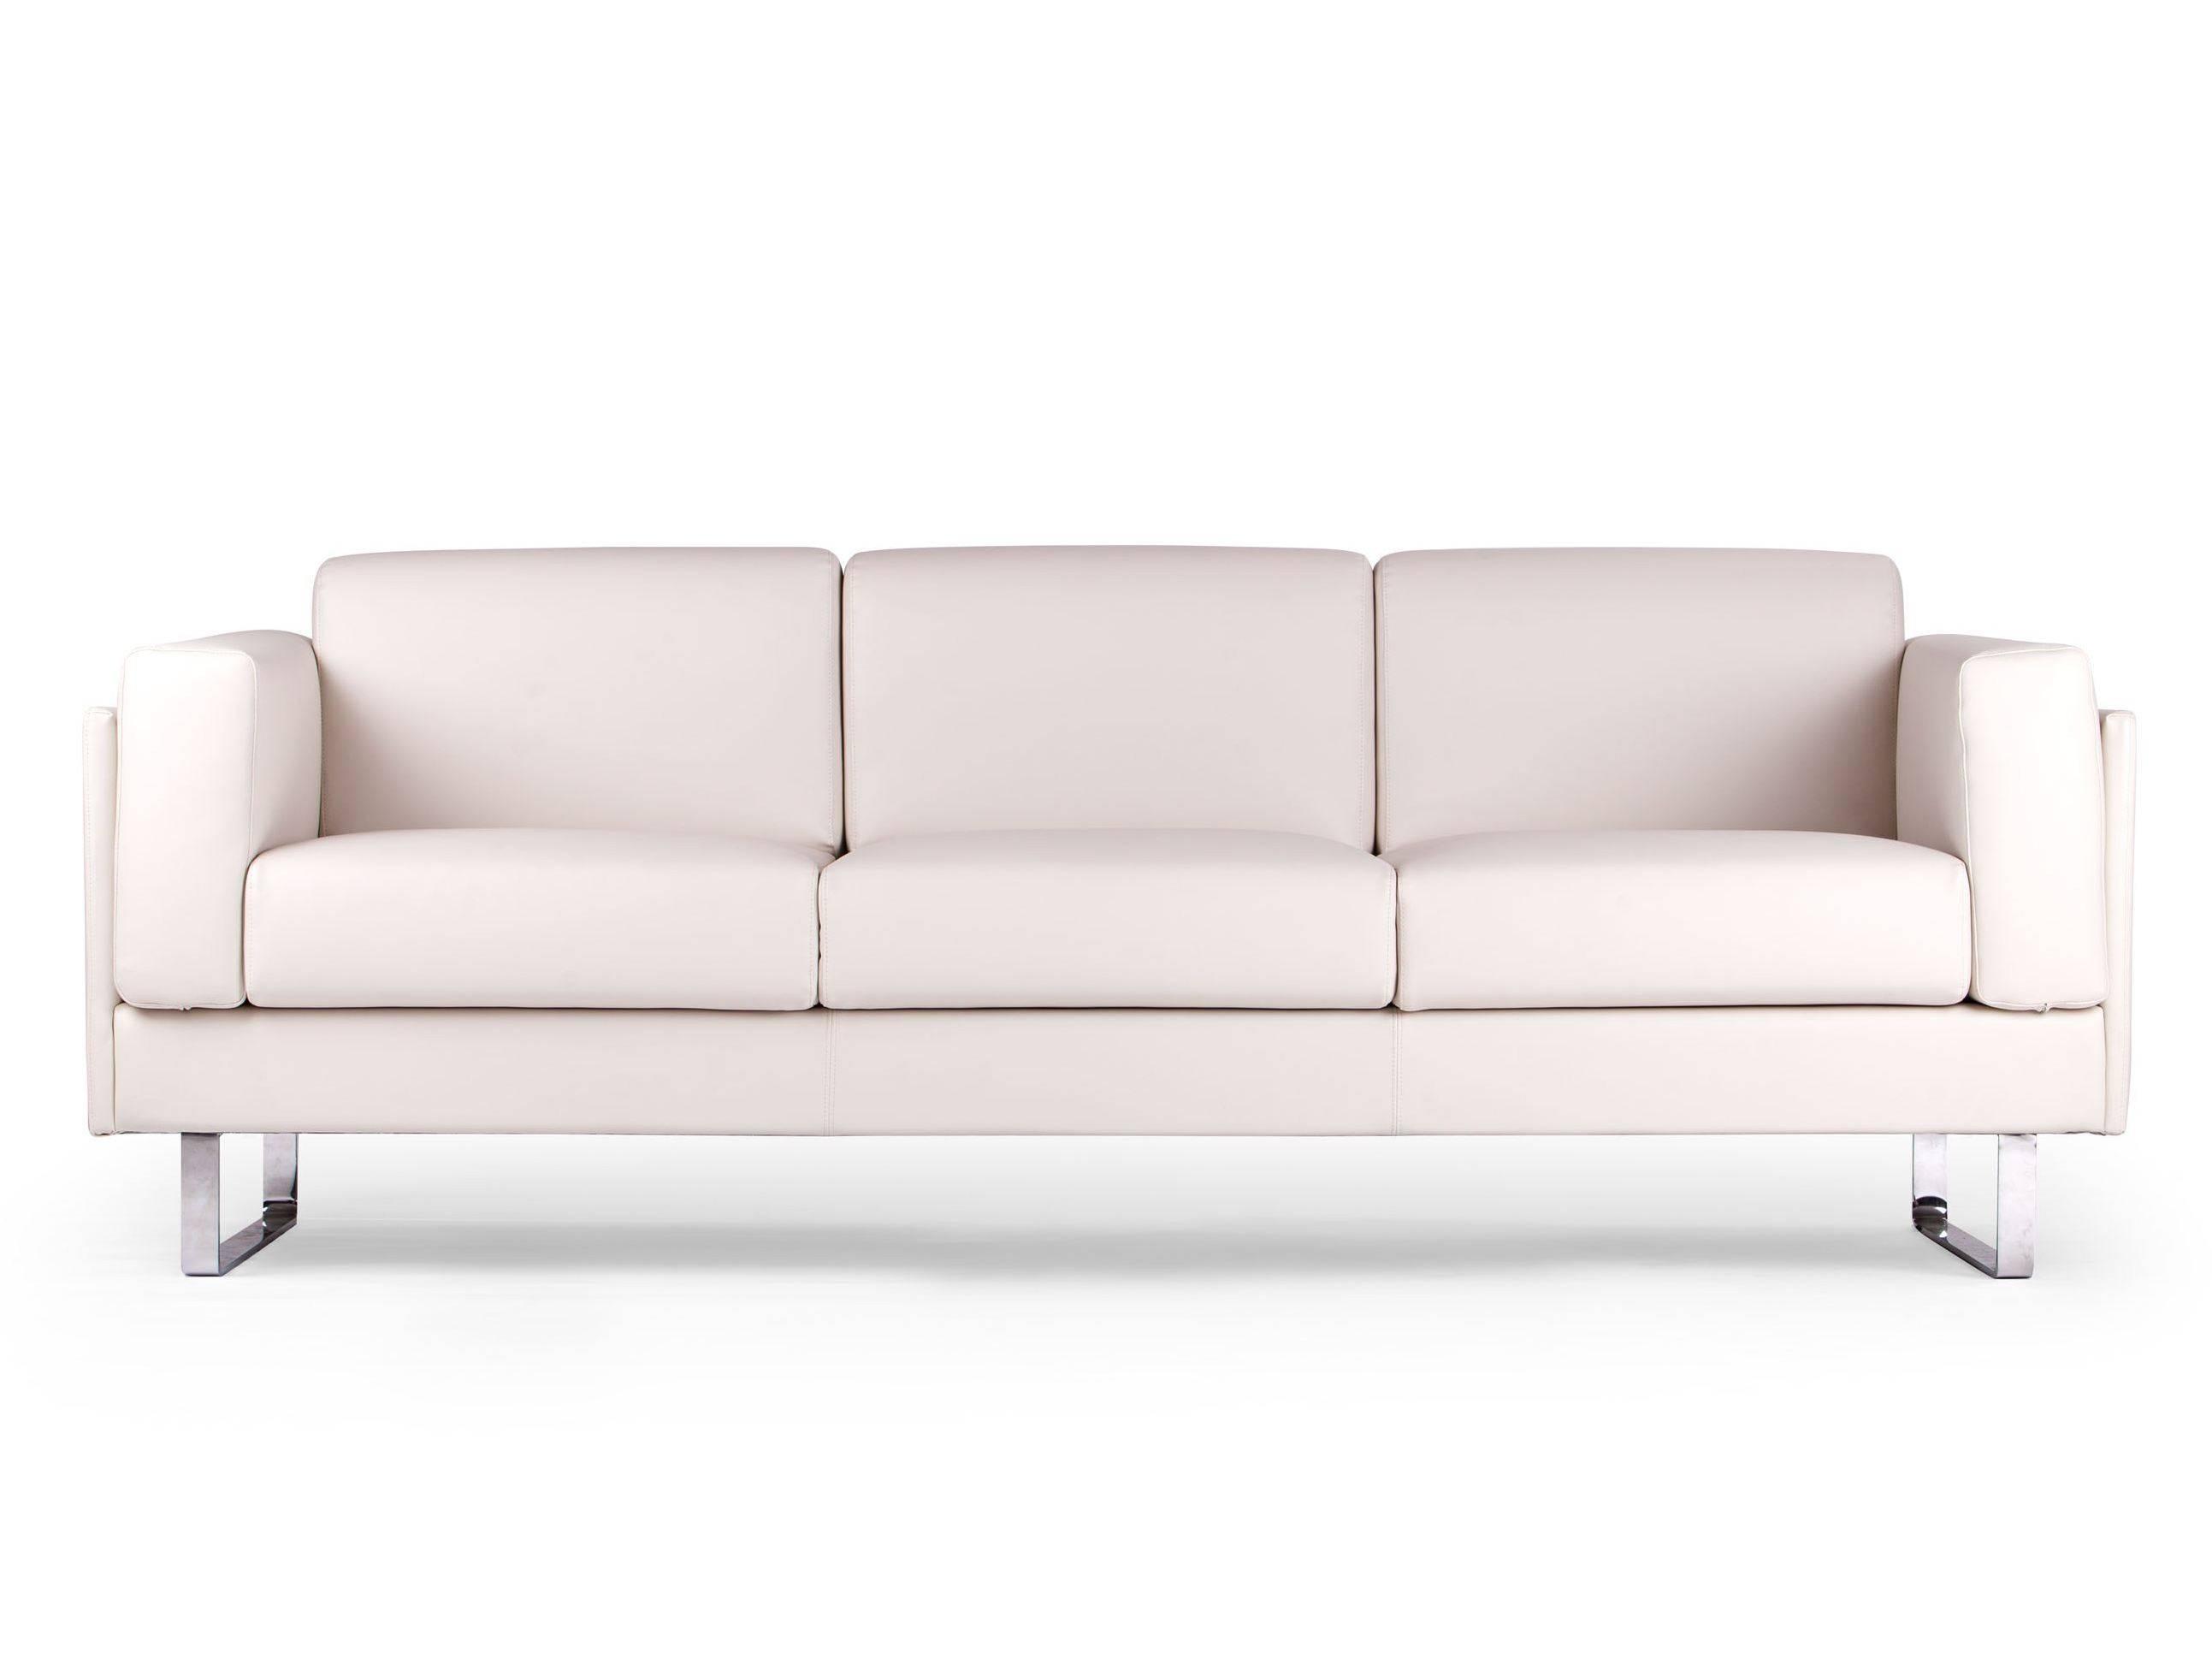 Cab | 3 Seater Sofatrue Design inside Three Seater Sofas (Image 12 of 30)